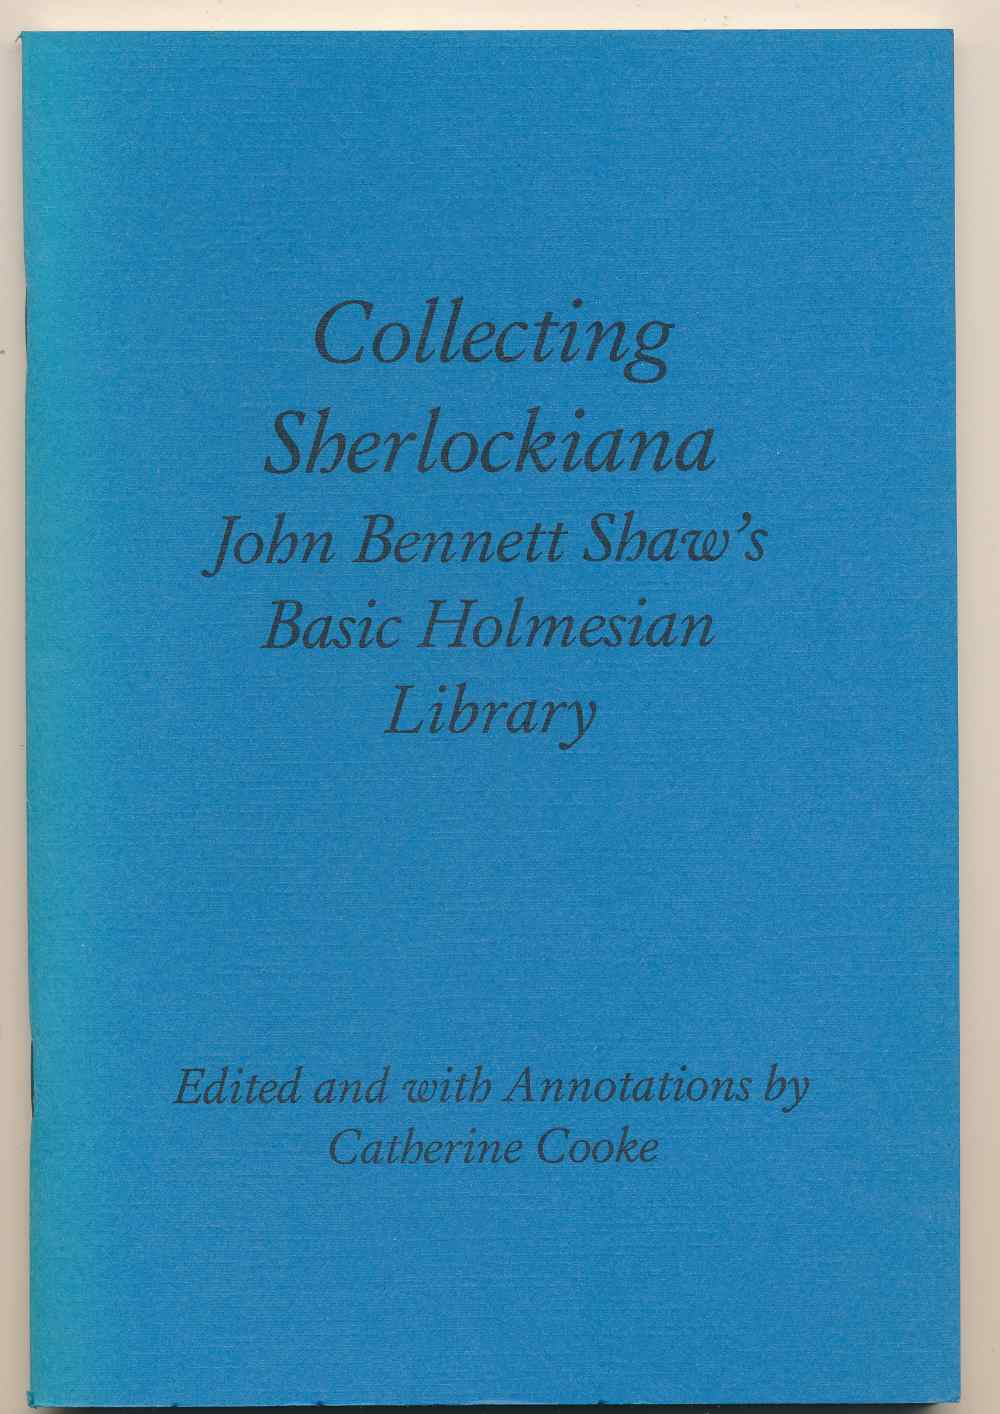 Collecting Sherlockiana : John Bennett Shaw's basic Holmesian library